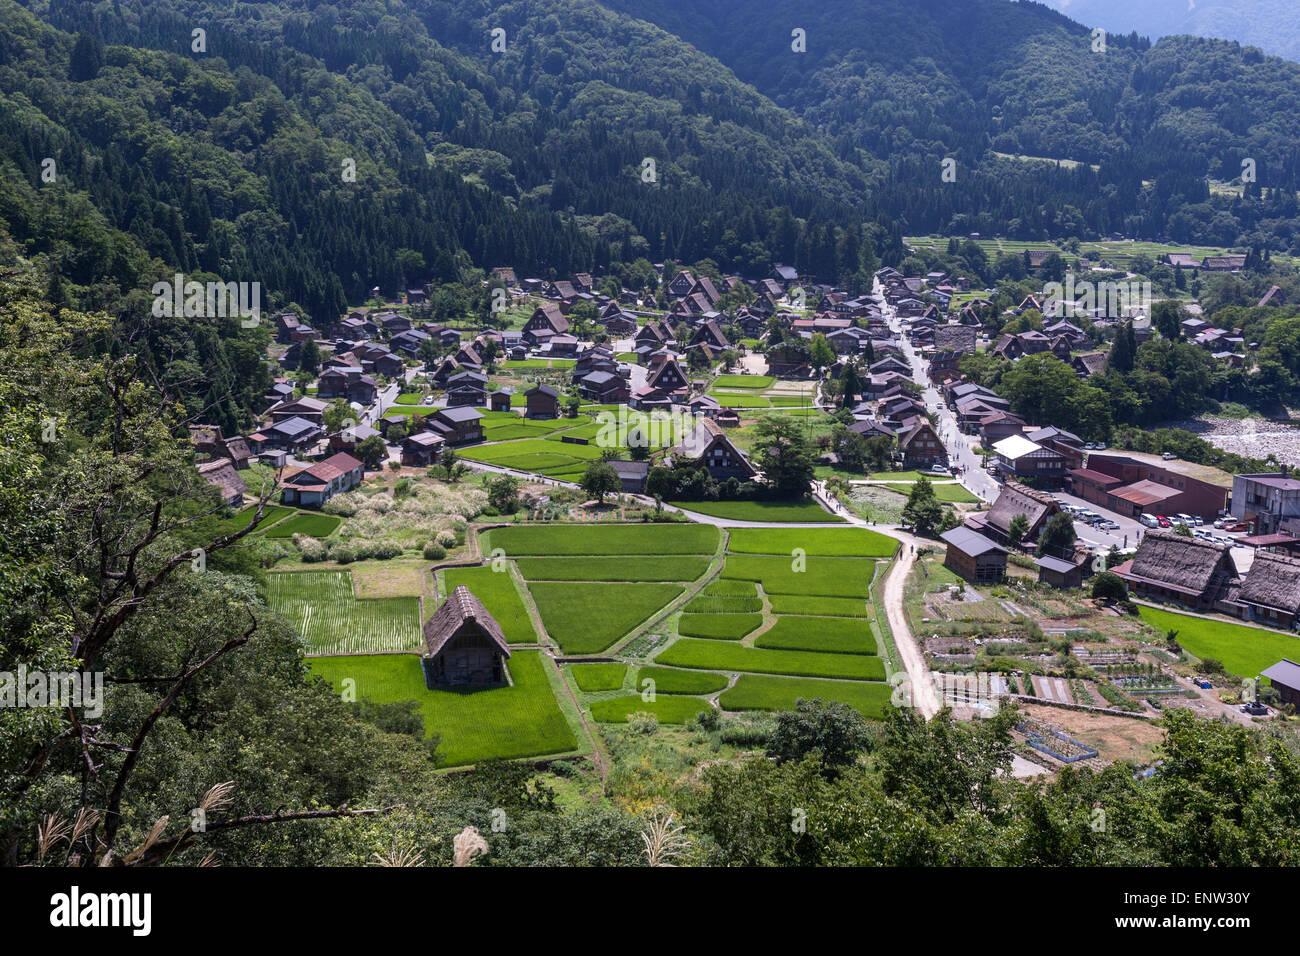 Overal view of Shirakawa-gō and Gokayama a traditional village with building style known as gasshō-zukuri. - Stock Image